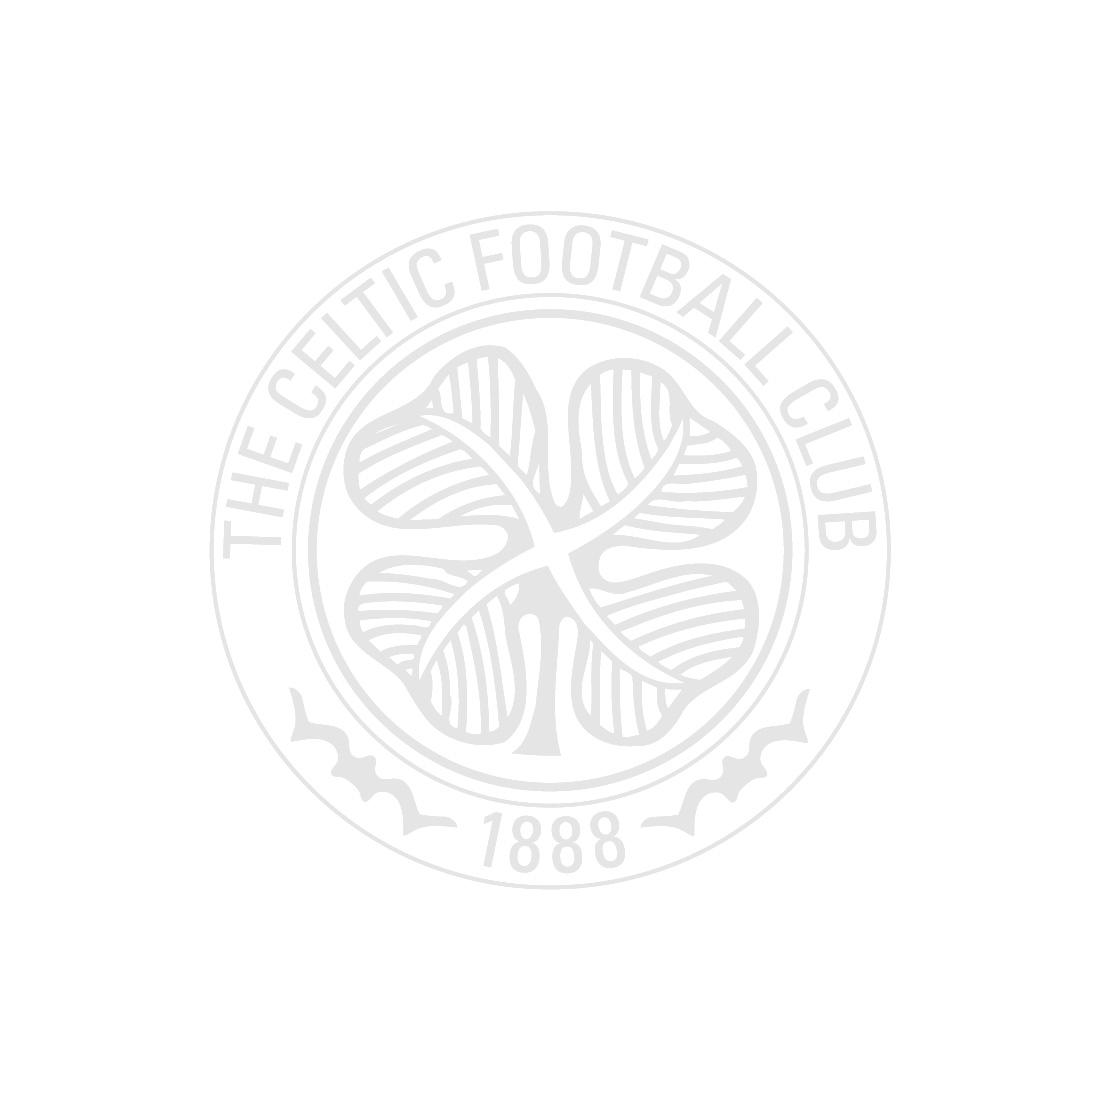 Celtic Marl Bootbag